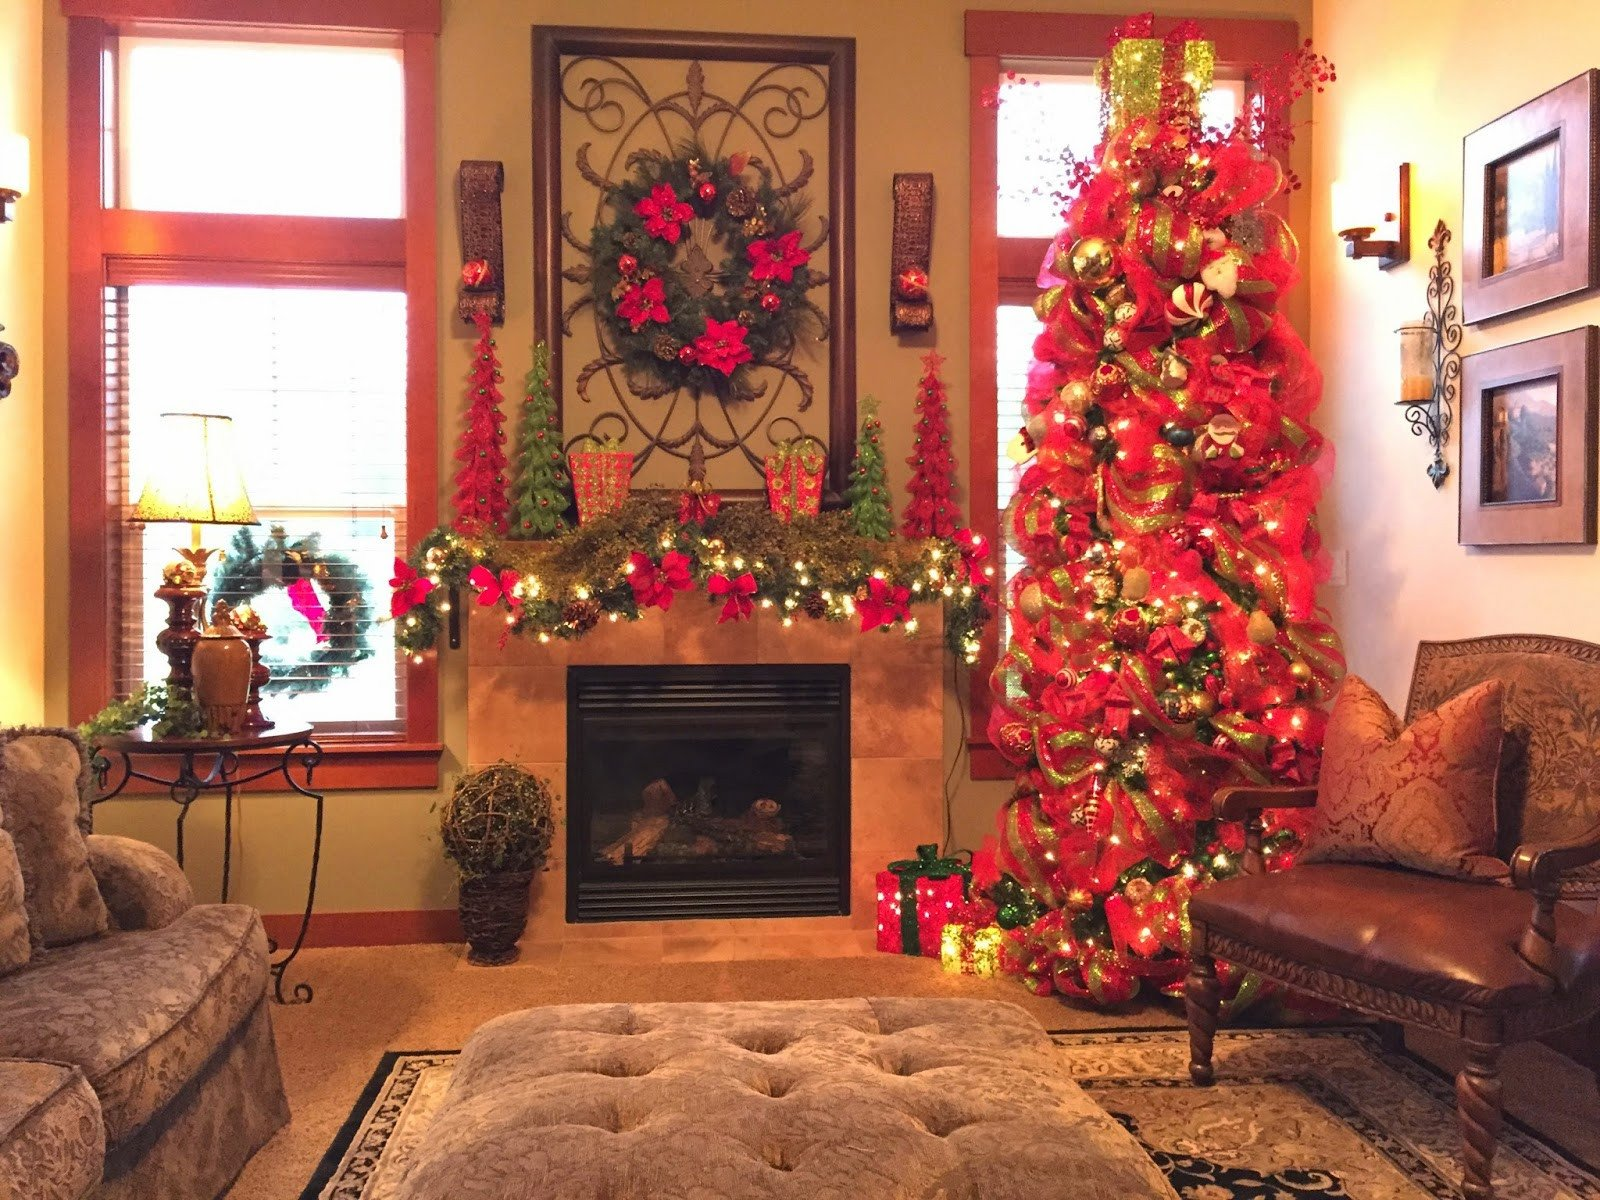 Tree Decor for Living Room the Tuscan Home the Living Room Christmas Tree